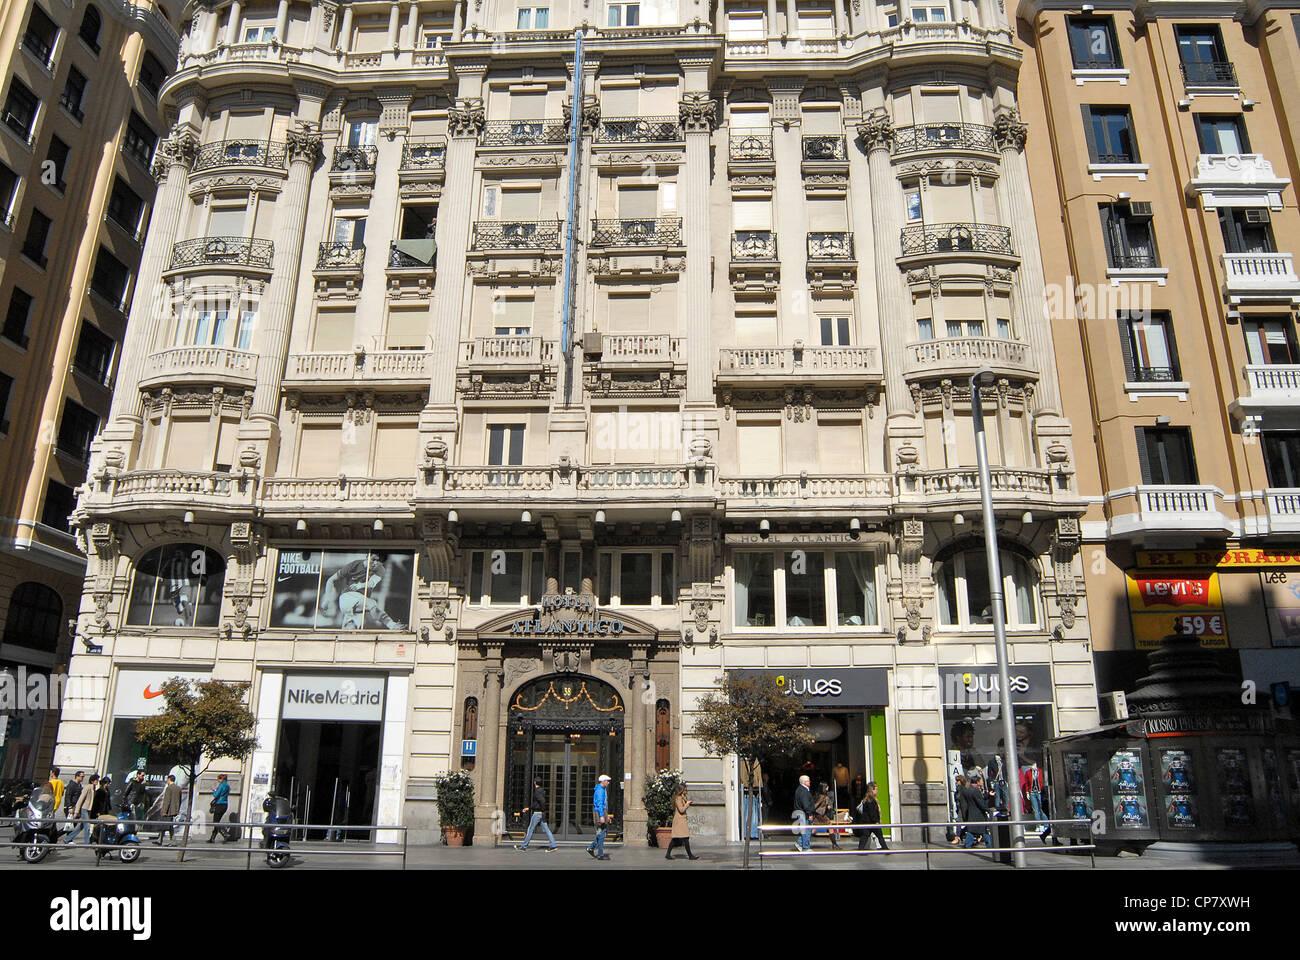 Barockbau Hotel Atlantico Gran Via Madrid Spanien Stockbild